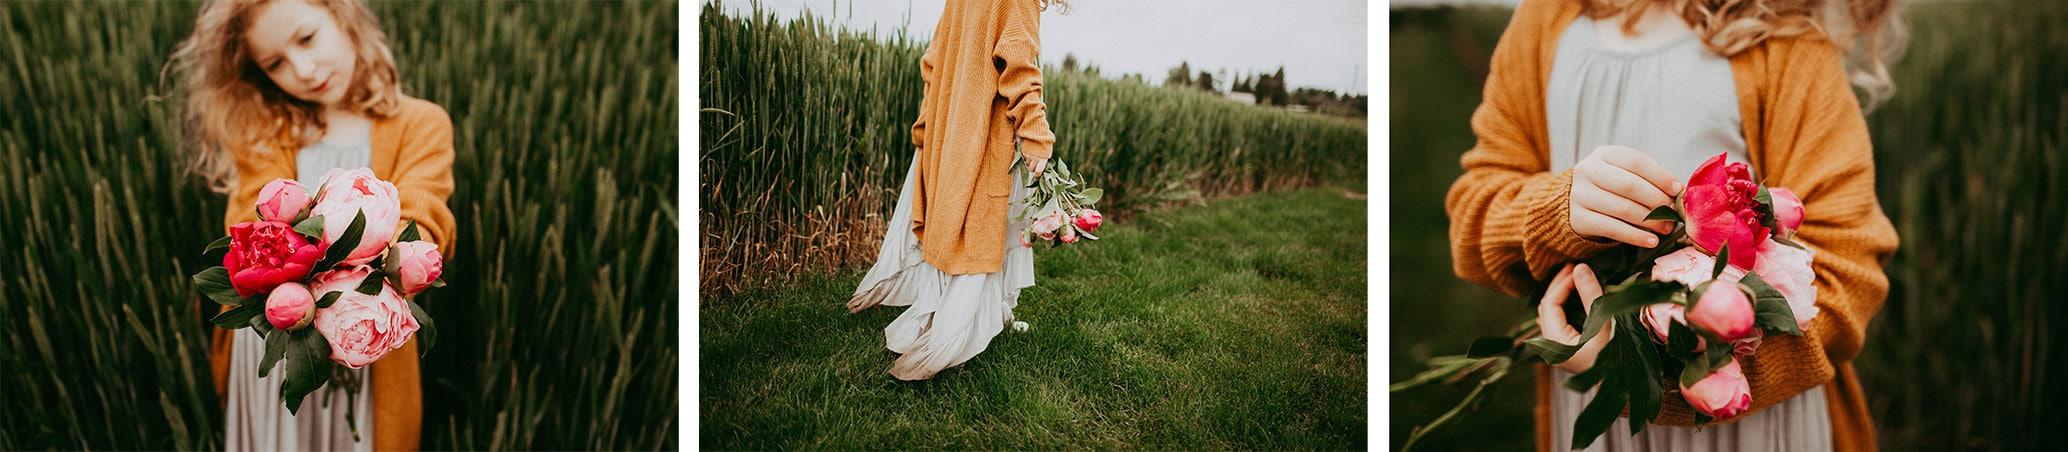 girl holding peony flowers at adelman gardens